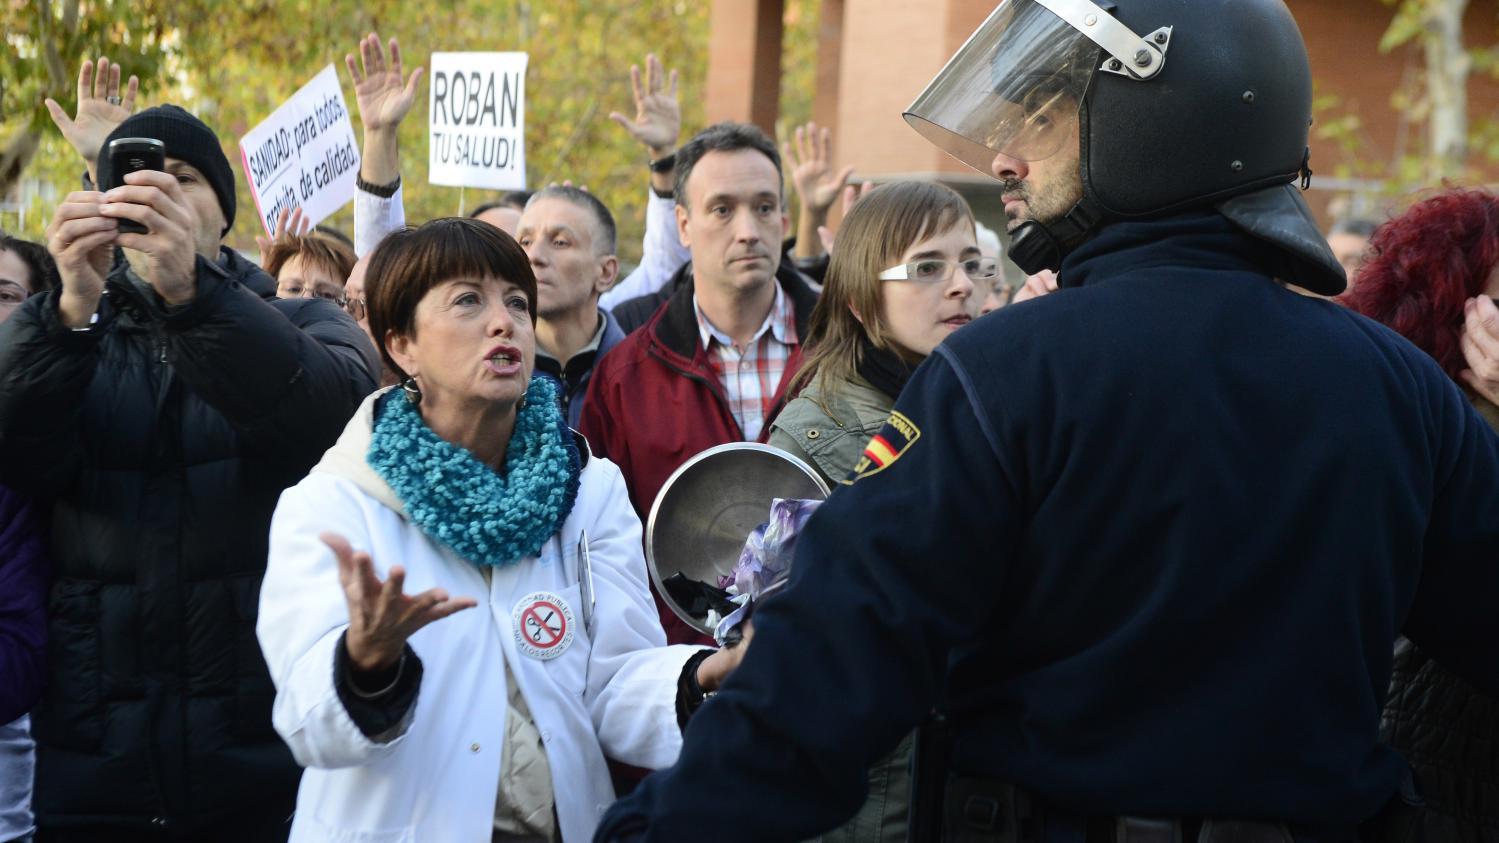 espagne  m u00e9decins et infirmiers d u00e9filent contre la  u0026quot privatisation u0026quot